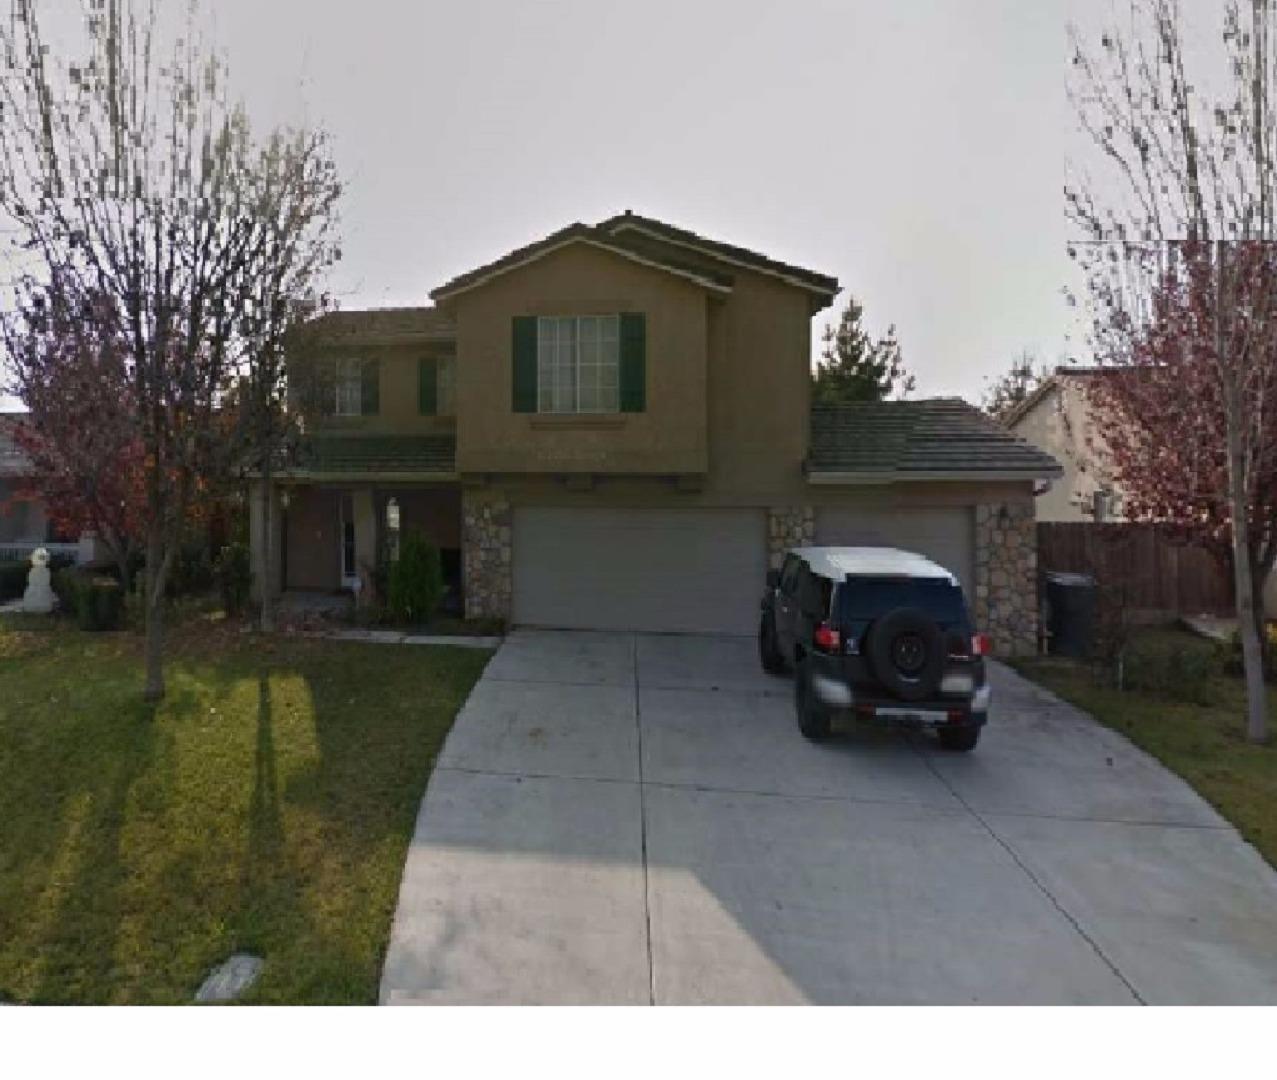 واحد منزل الأسرة للـ Sale في 3939 W Delta Avenue 3939 W Delta Avenue Visalia, California 93291 United States